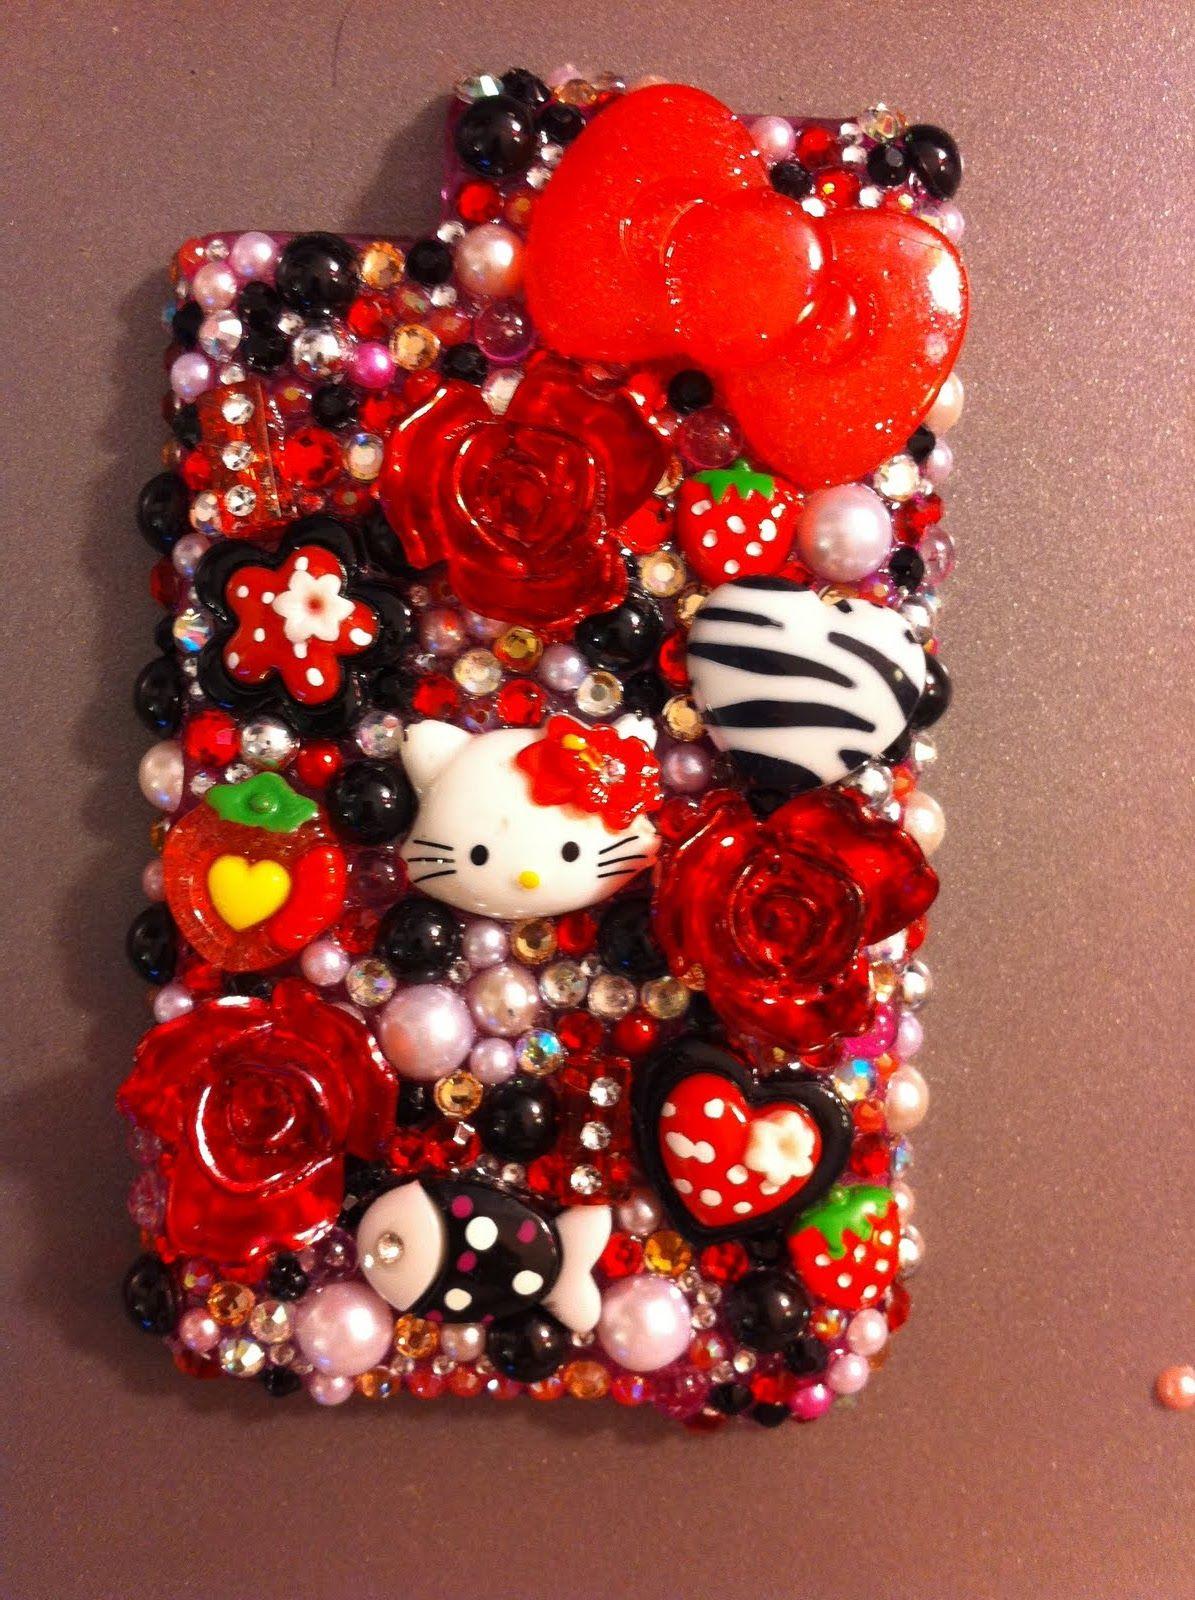 Simple Wallpaper Hello Kitty Ipod Touch - c9261f919ab70f60cf0456ad92e61b2e  Snapshot_494645.jpg